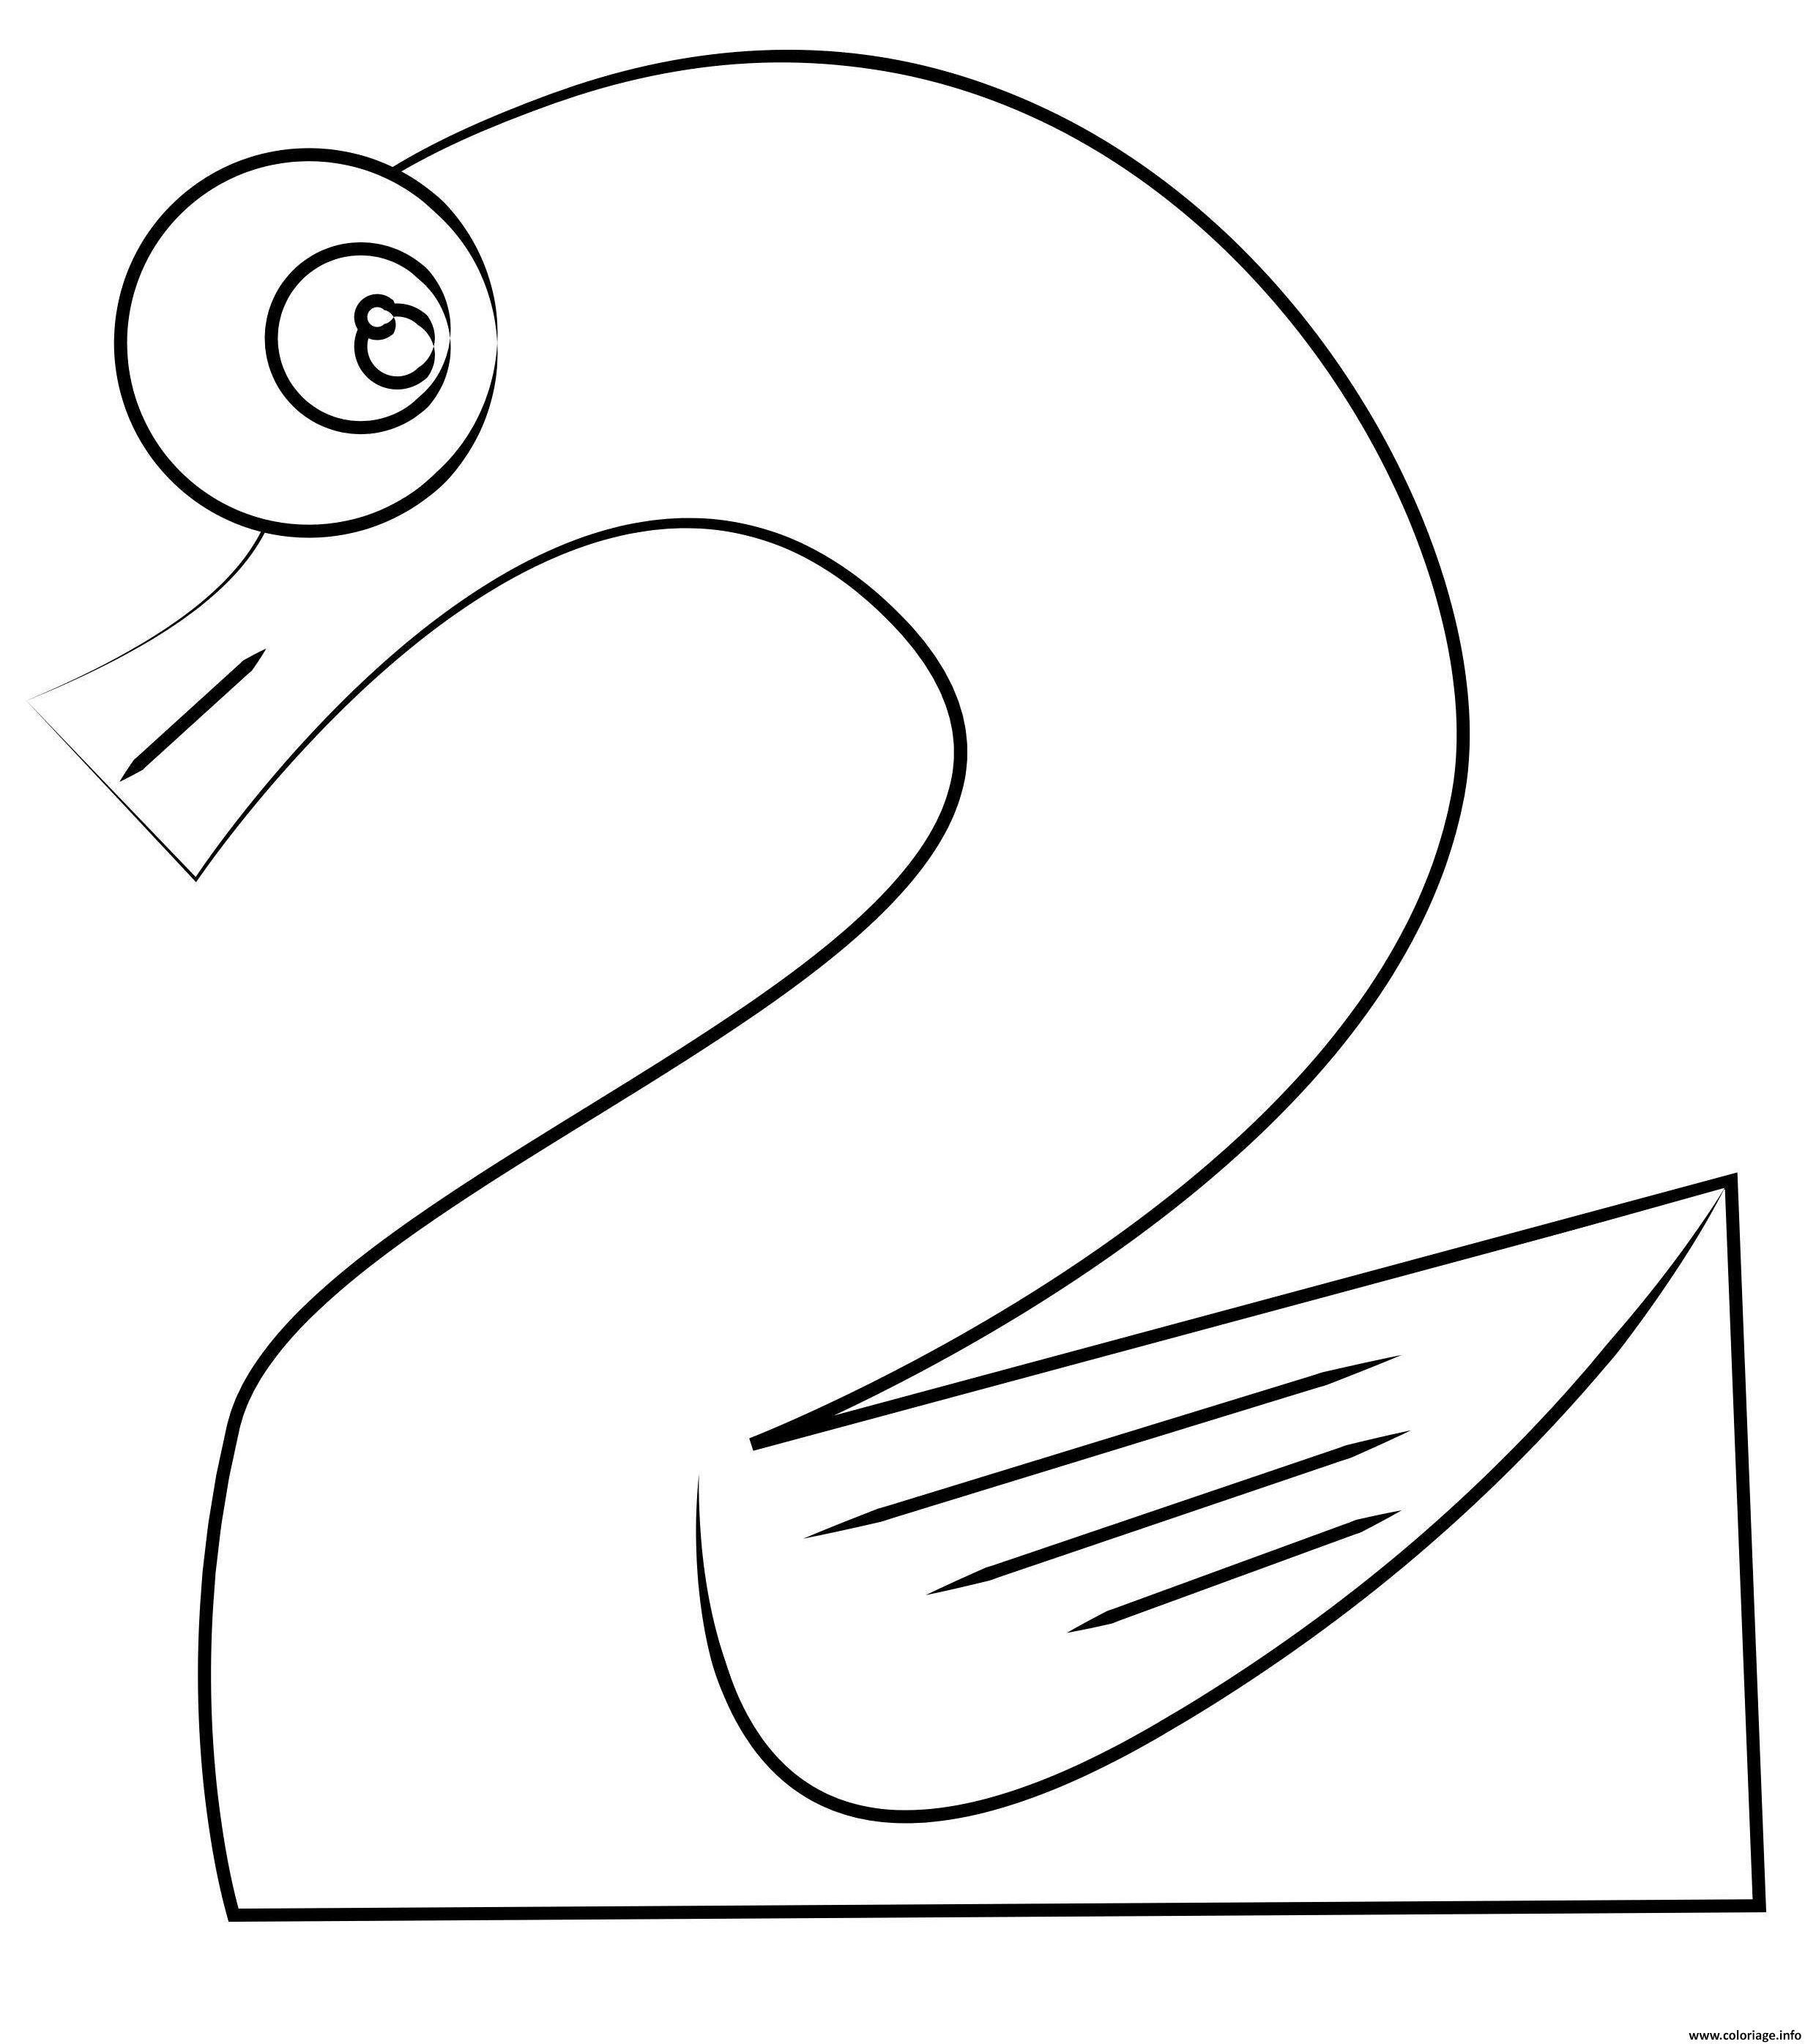 Coloriage chiffre 2 maternelle - Chiffre a colorier ...